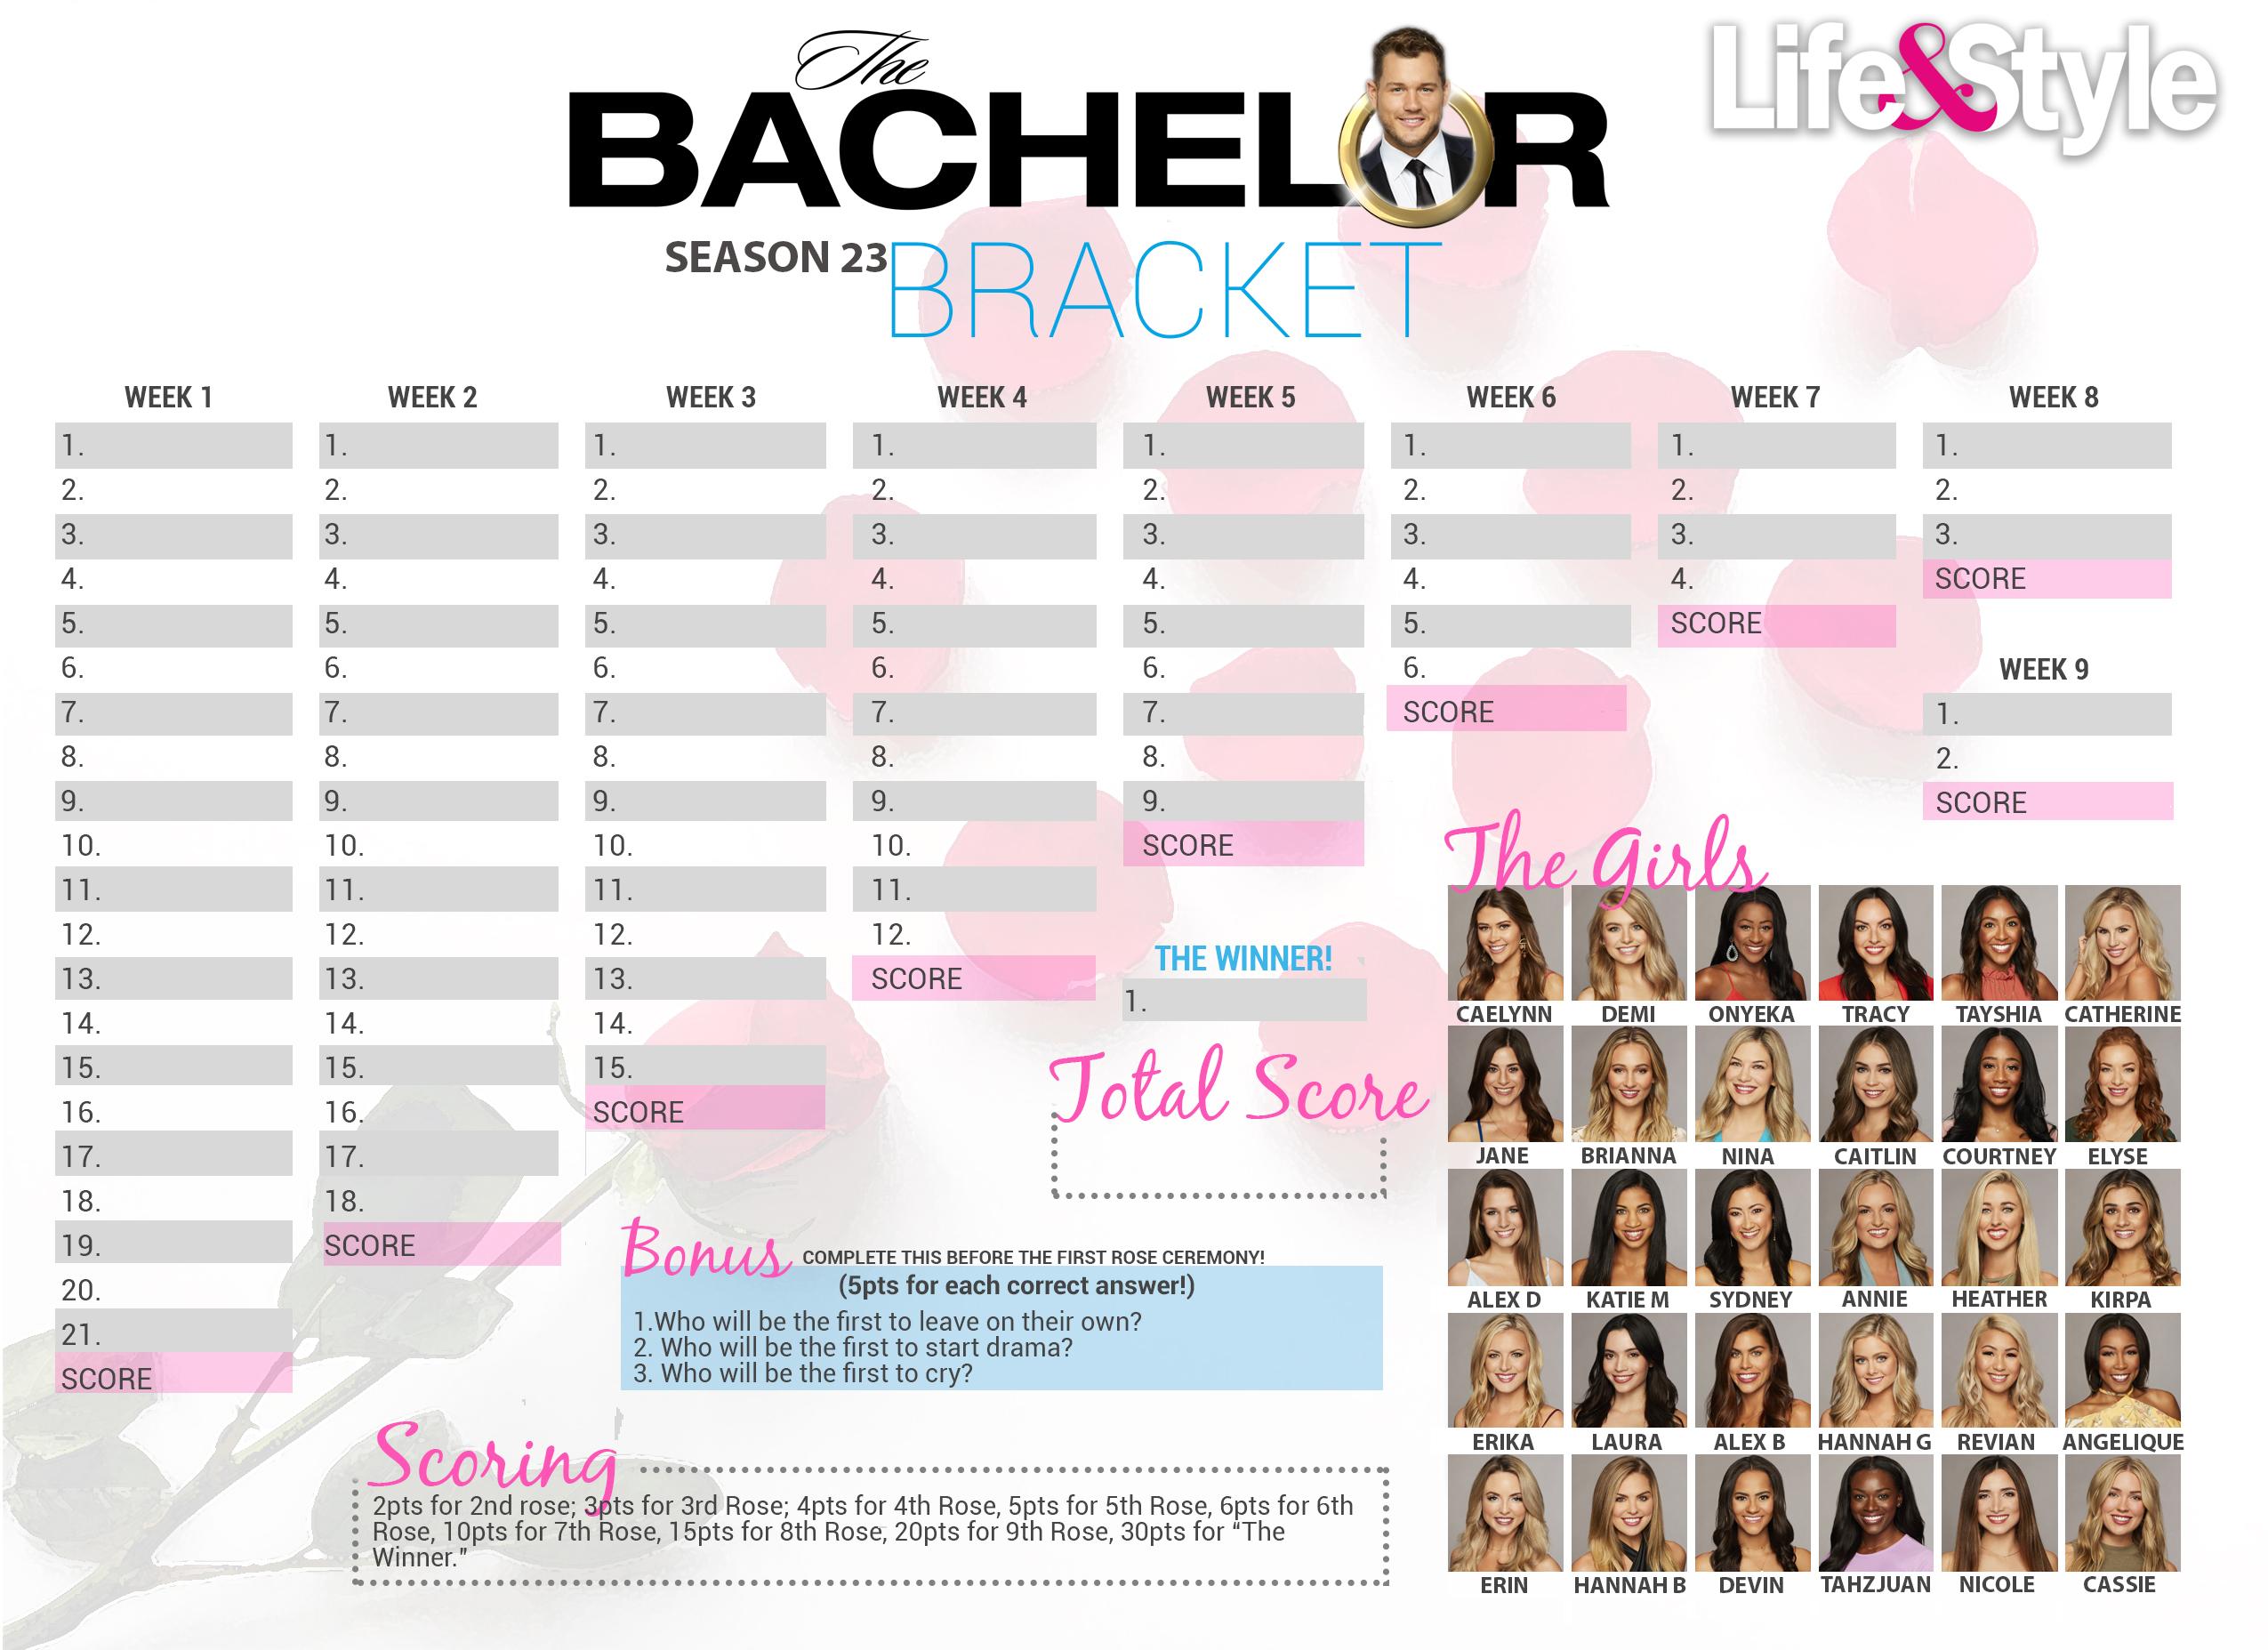 photograph relating to Bachelor Bracket Printable named The Prinatable Bachelor Bracket For Colton Underwoods Time